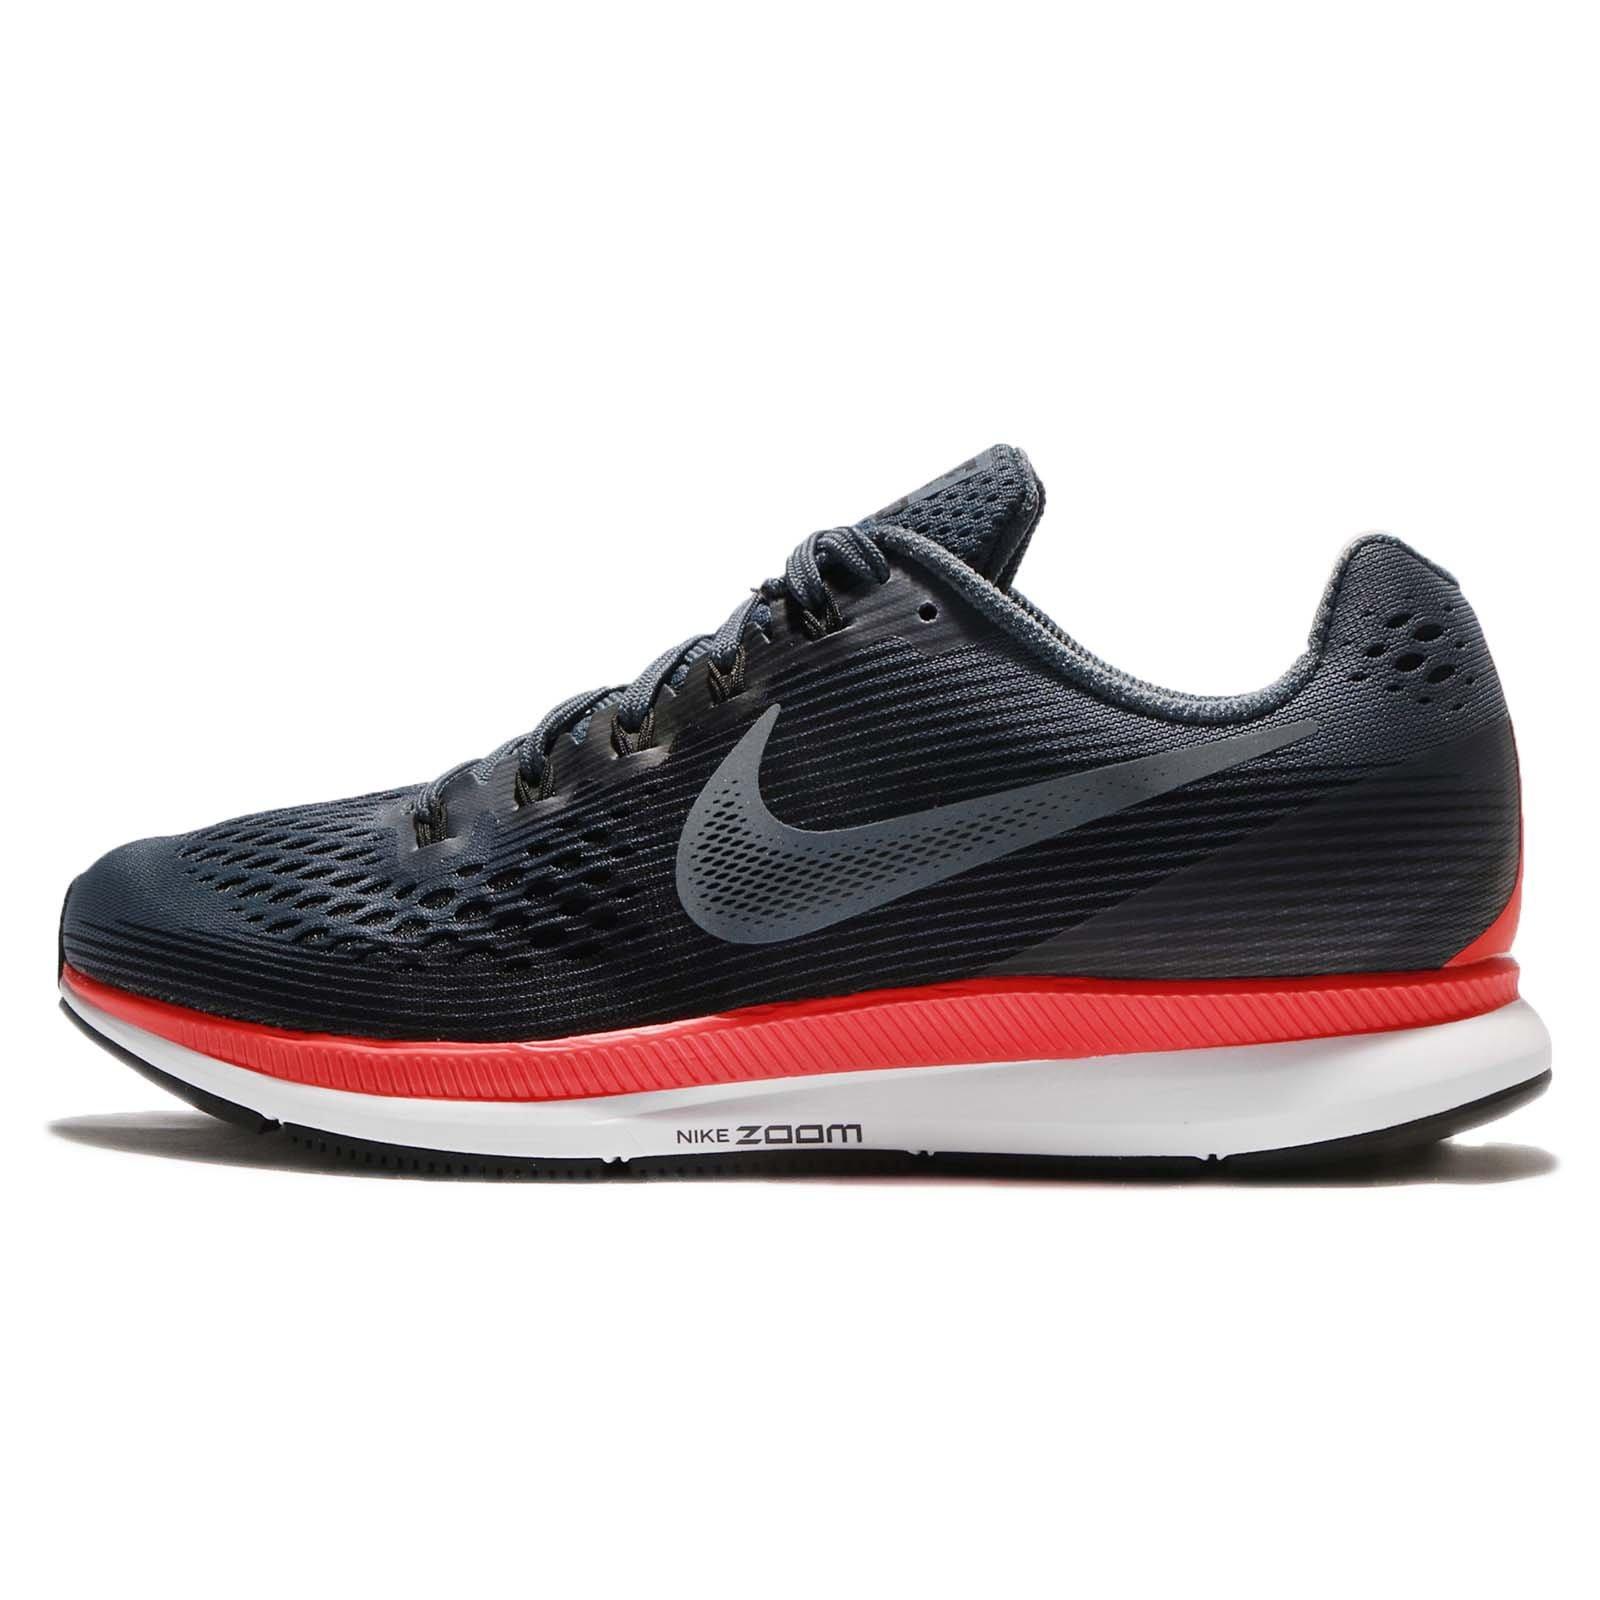 Nike Women's Air Zoom Pegasus 34 Running Shoes-Blue Fox/Black-5 by Nike (Image #1)